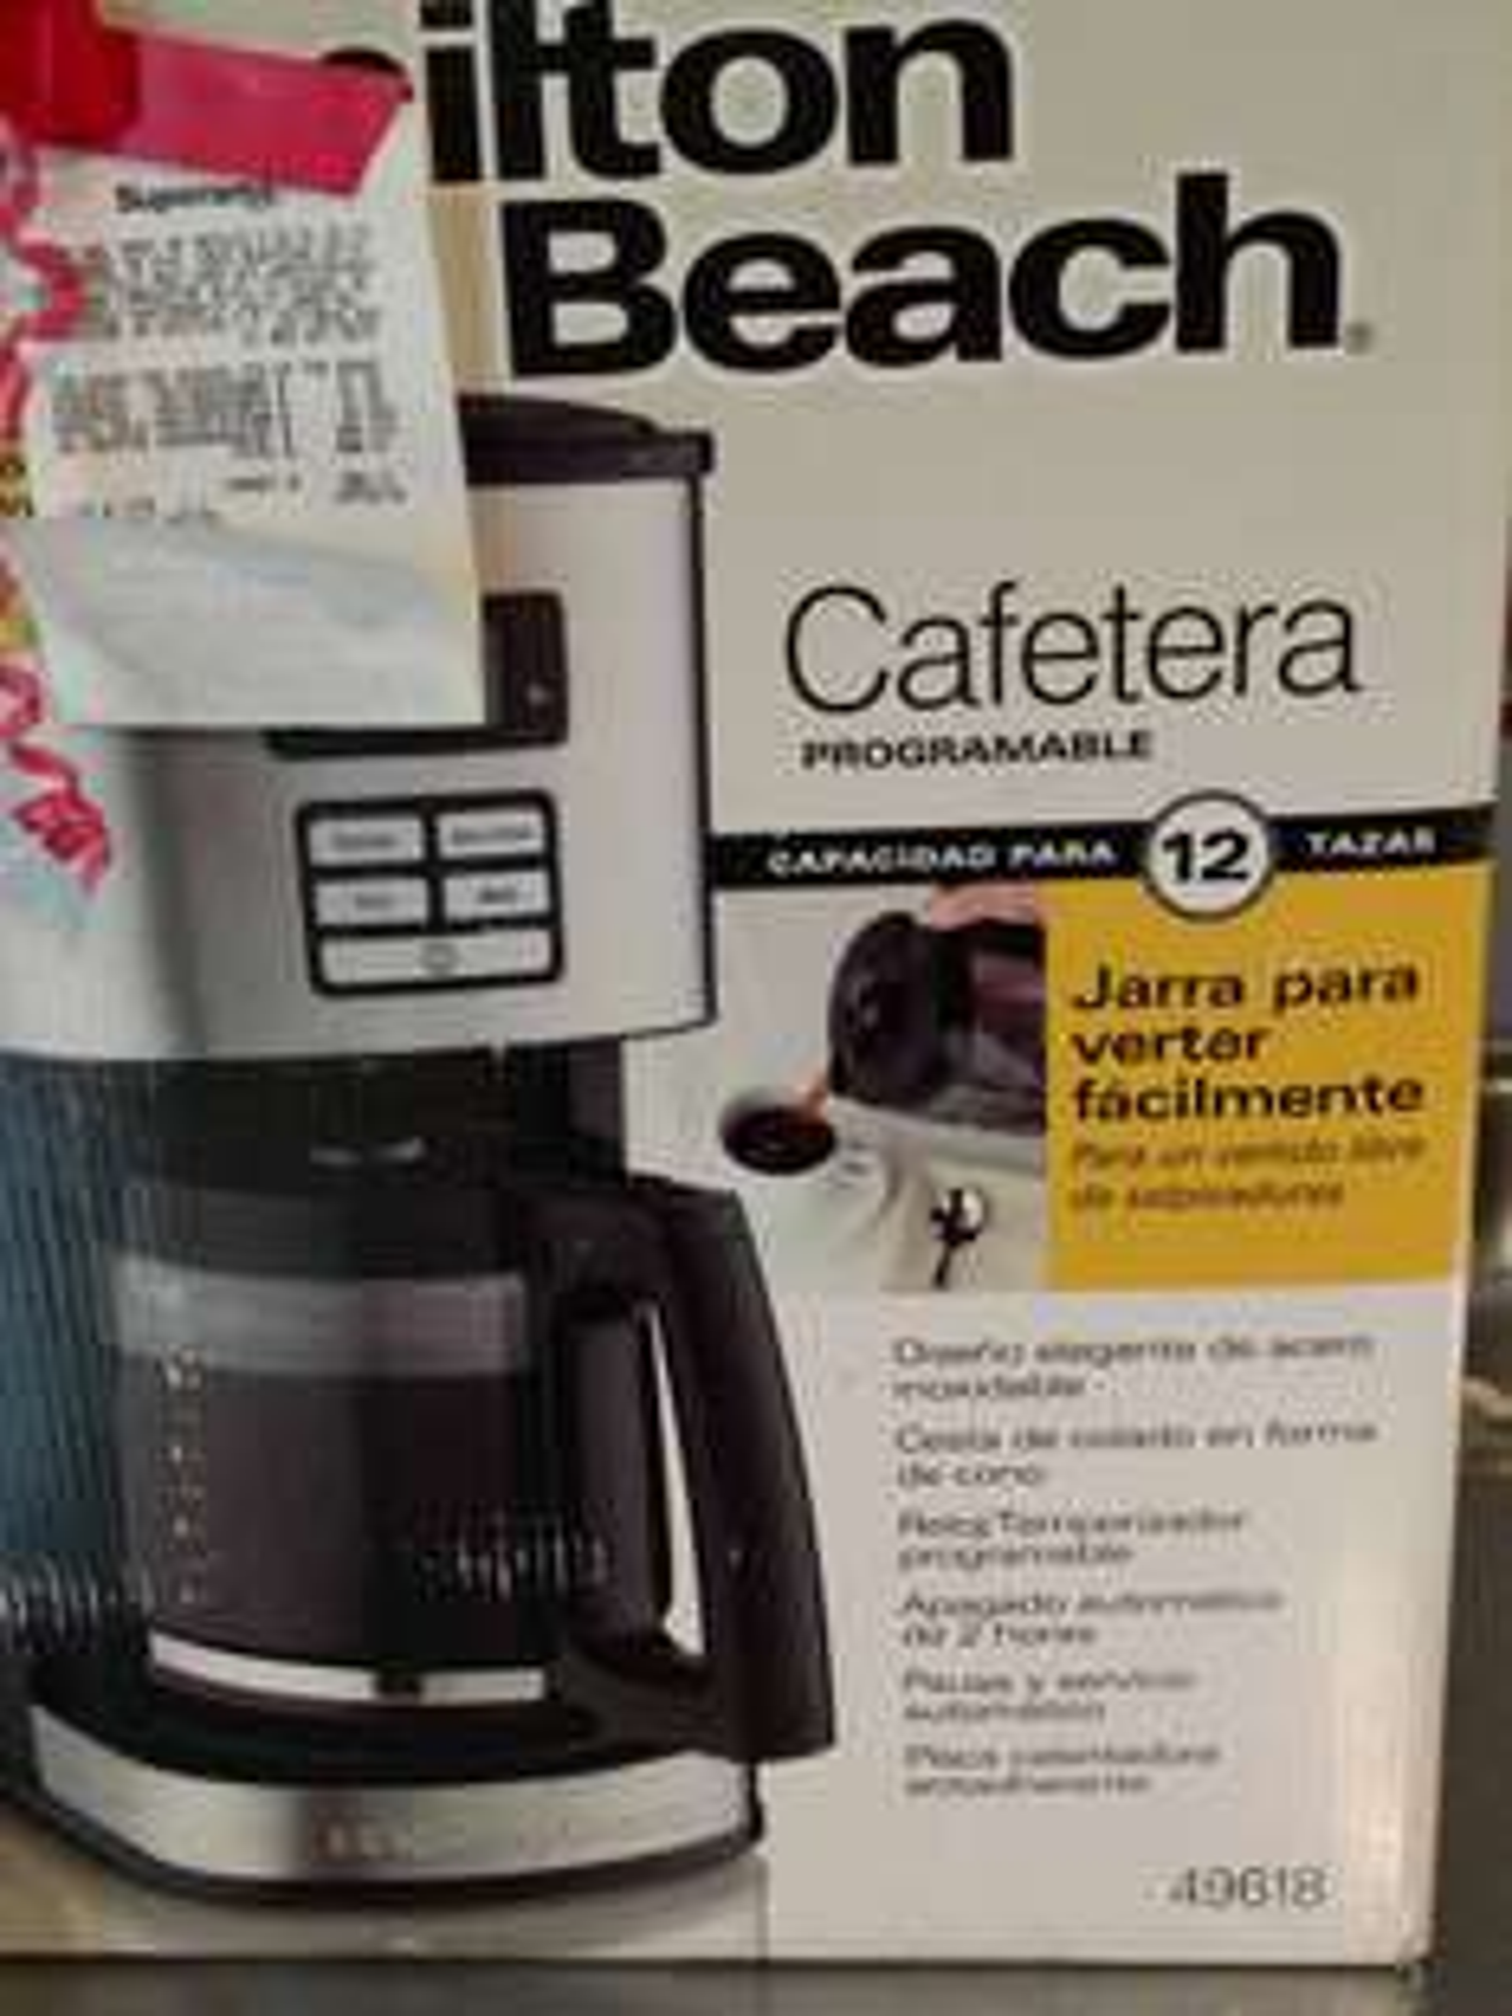 Superama campestre Aguascalientes. Cafetera Hamilton beach modelo 49618